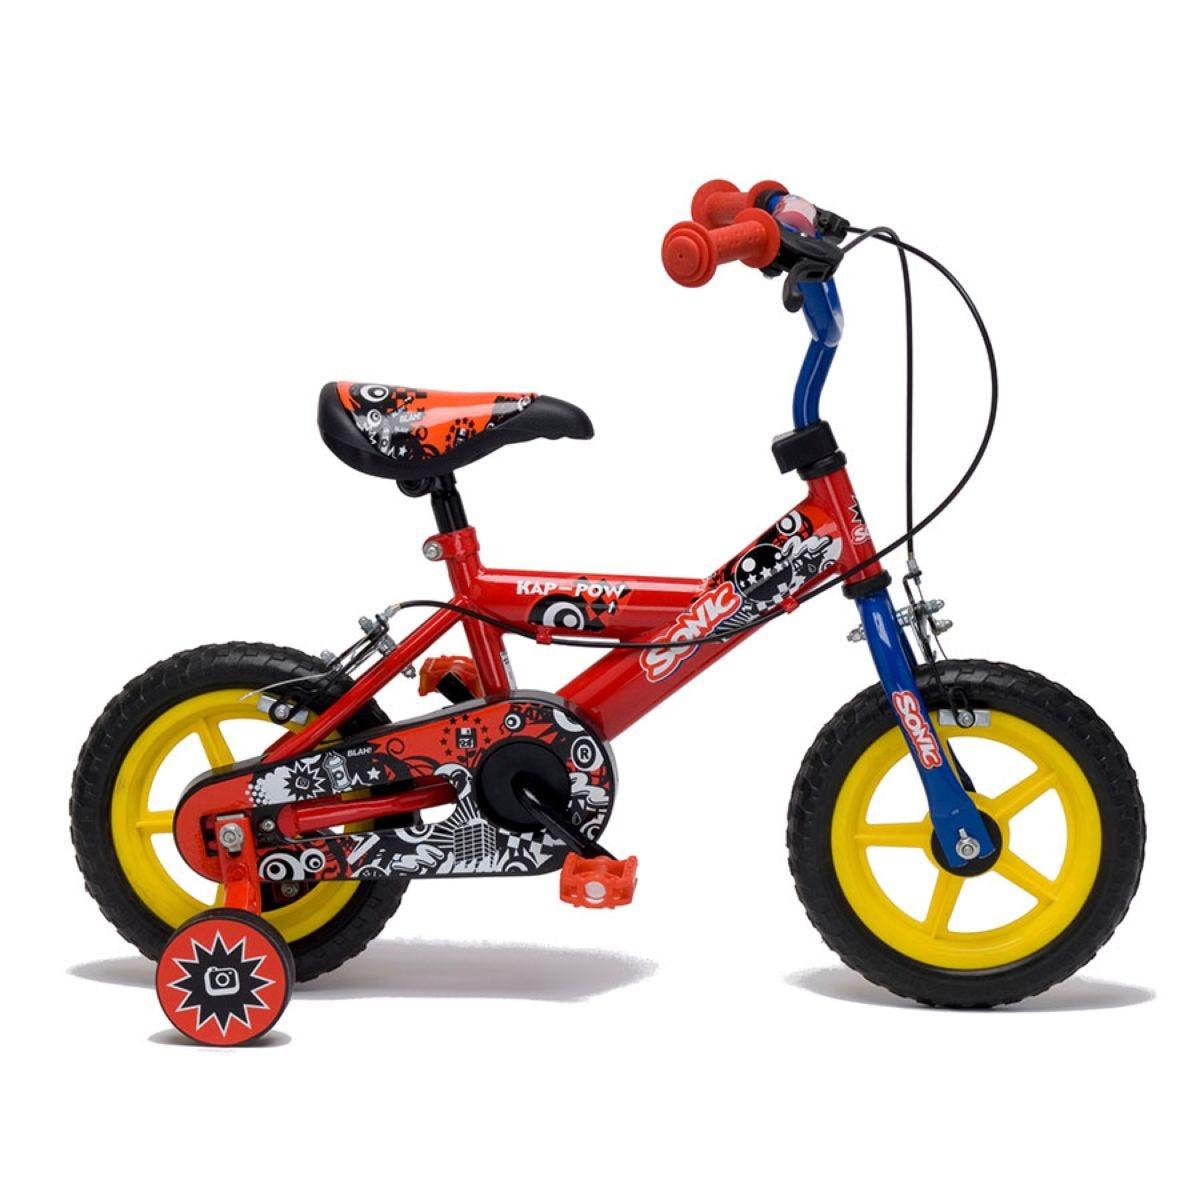 Sonic Kap-Pow Bike 12-Inch – Red/Blue